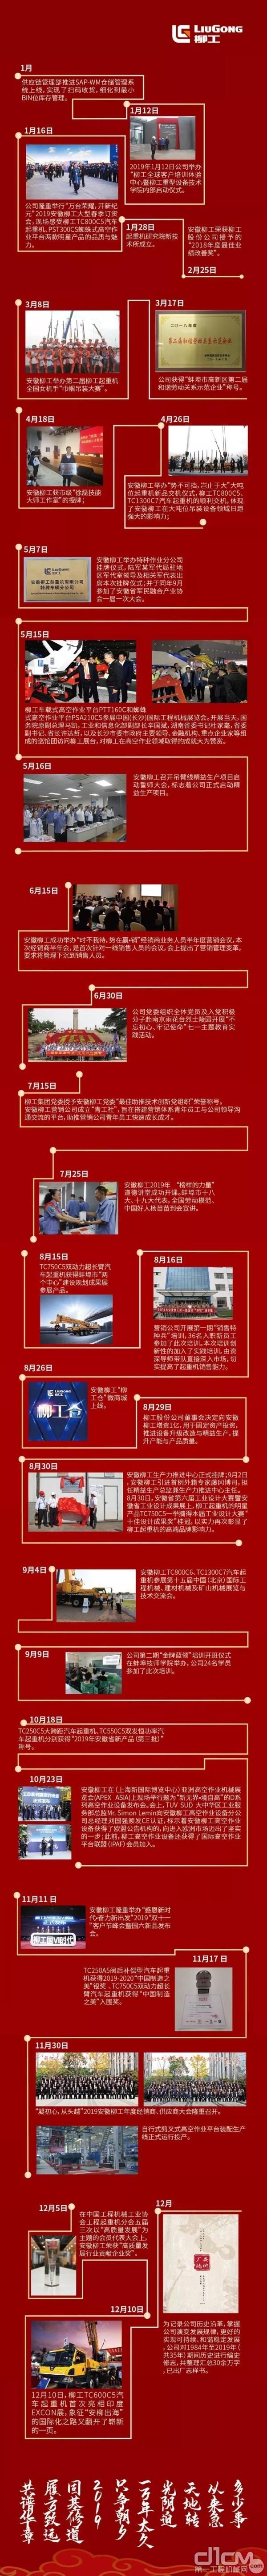 安徽<a href=http://product.d1cm.com/brand/liugong/ target=_blank>柳工</a>2019大事记